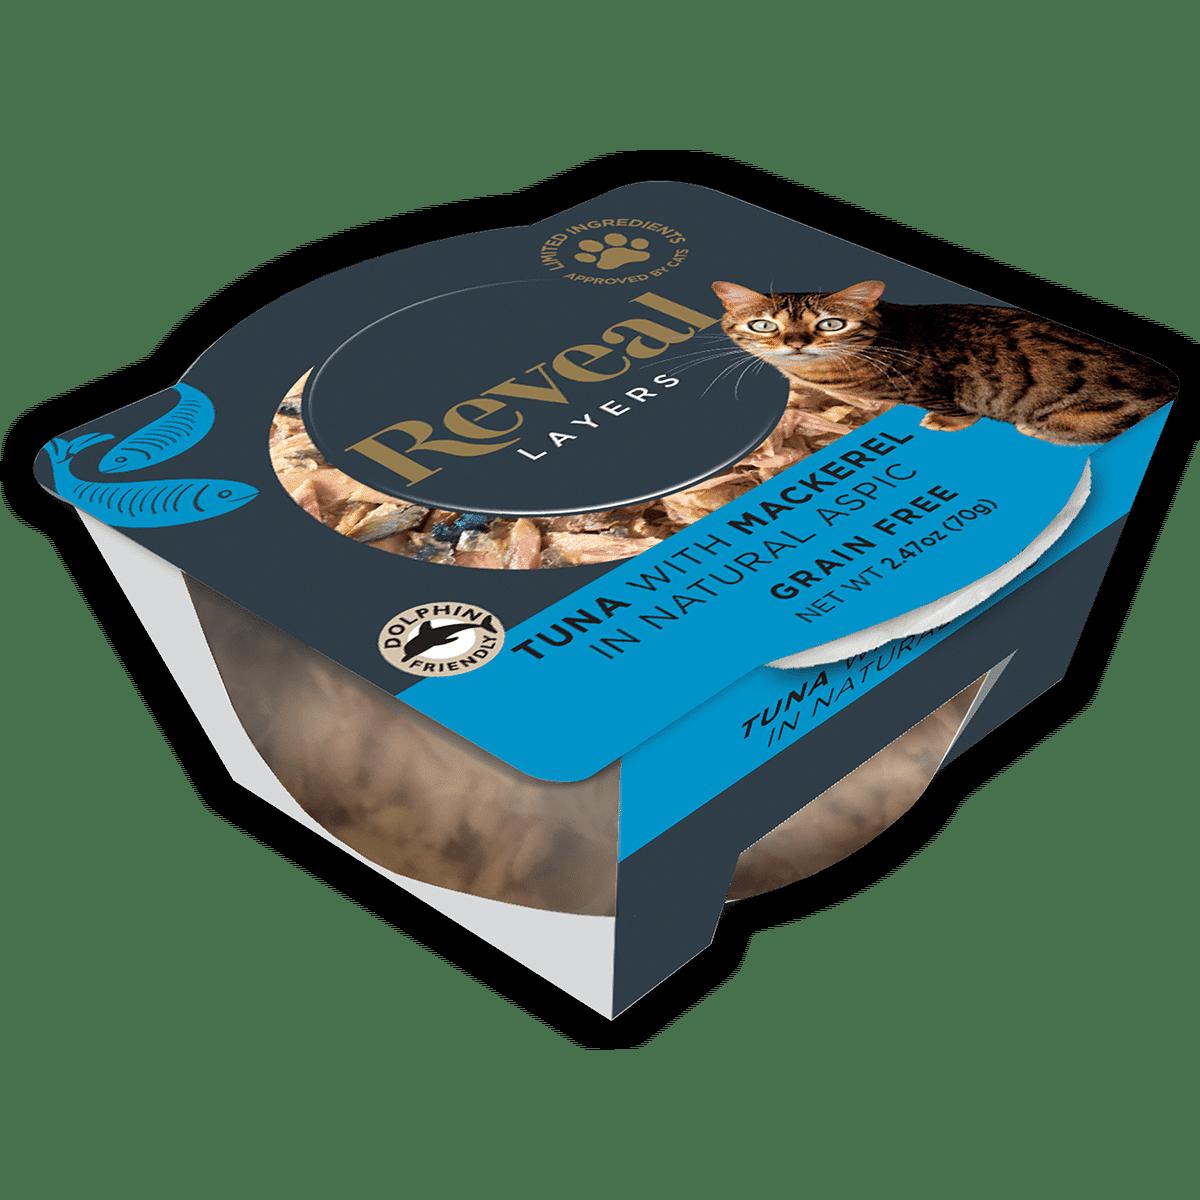 Photo of a Reveal tuna and mackerel cat food pot